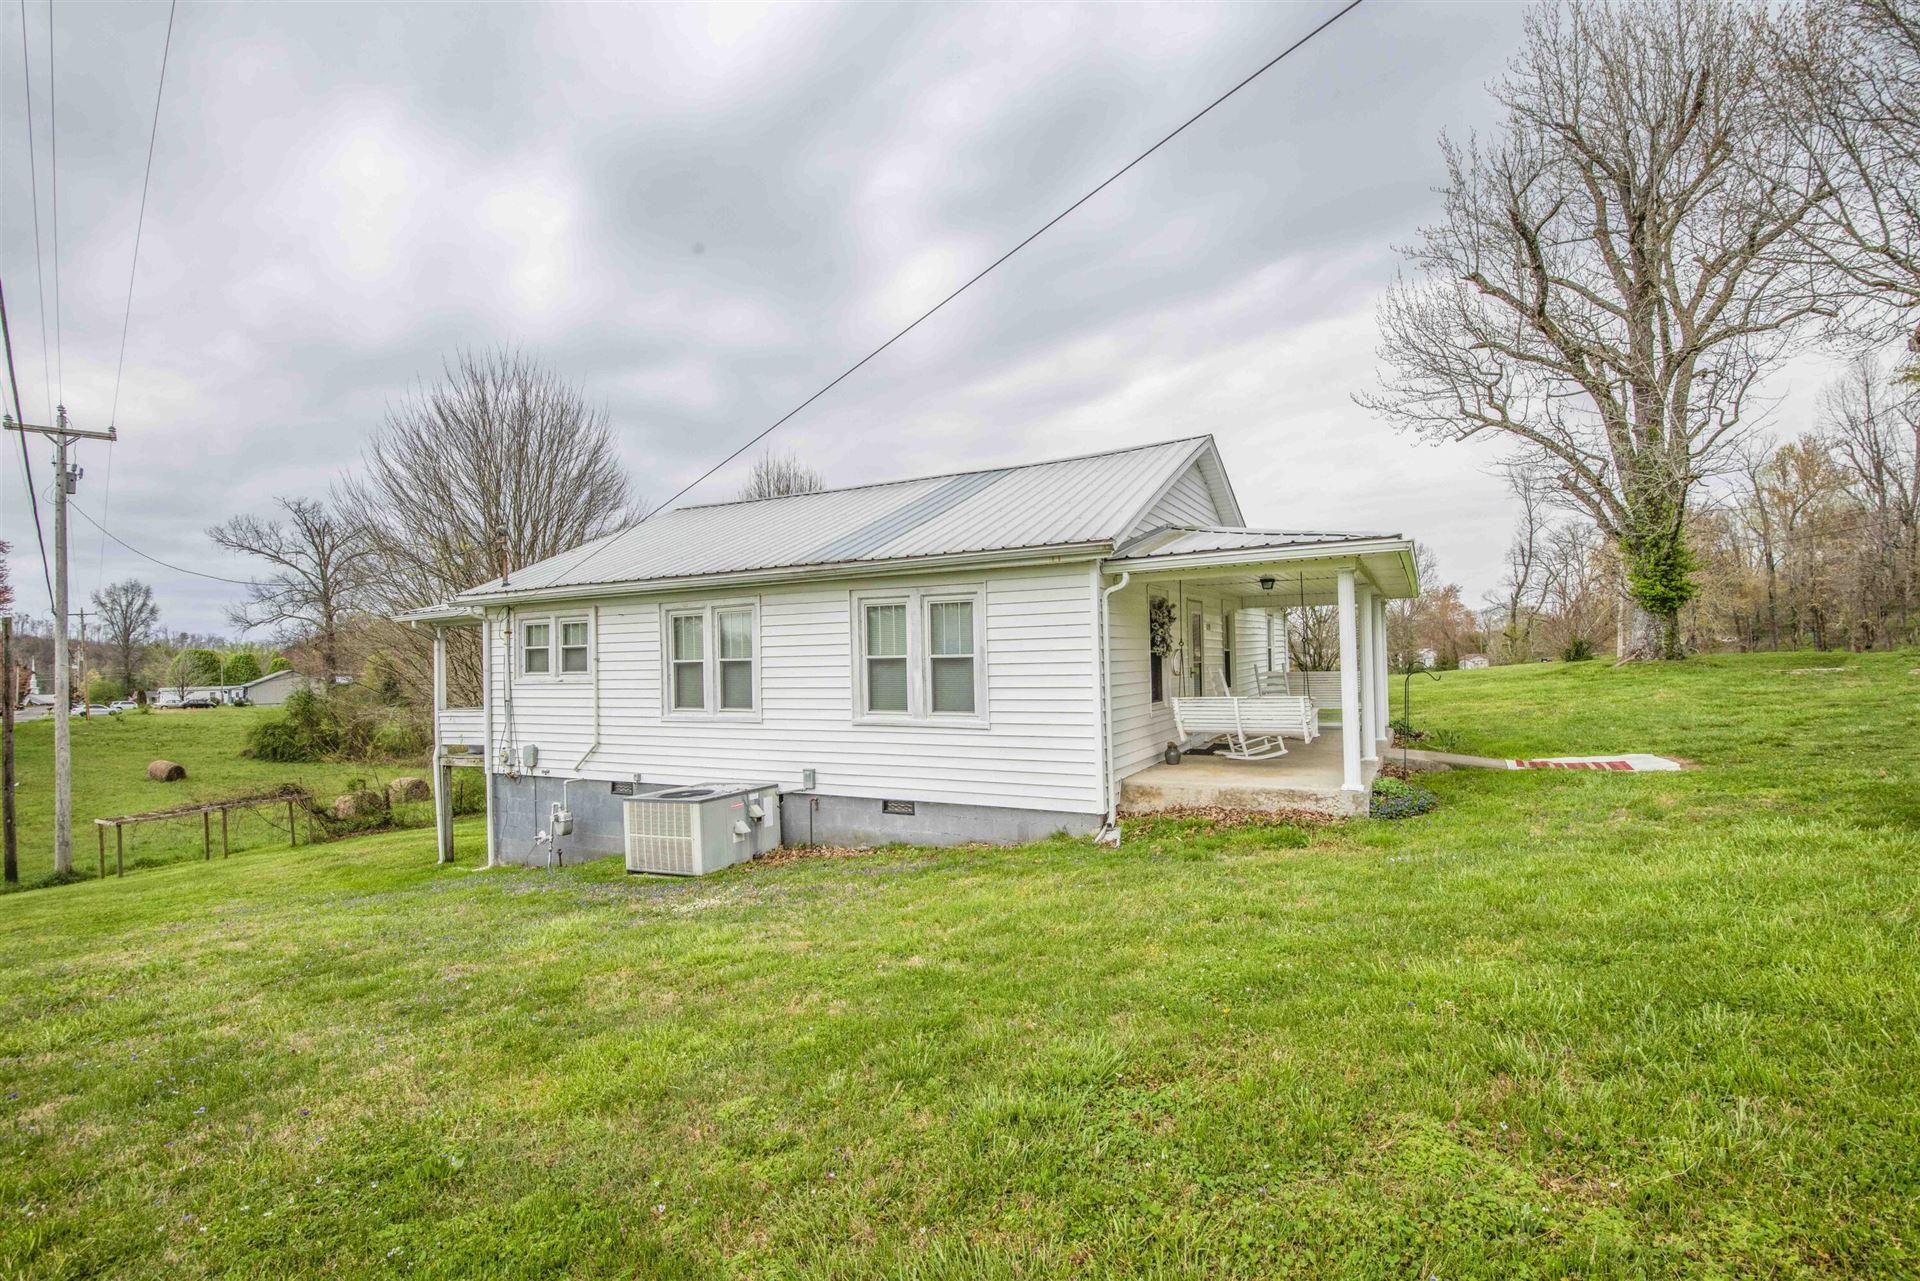 Photo of 219 Burchfield Ave, Oneida, TN 37841 (MLS # 1147310)